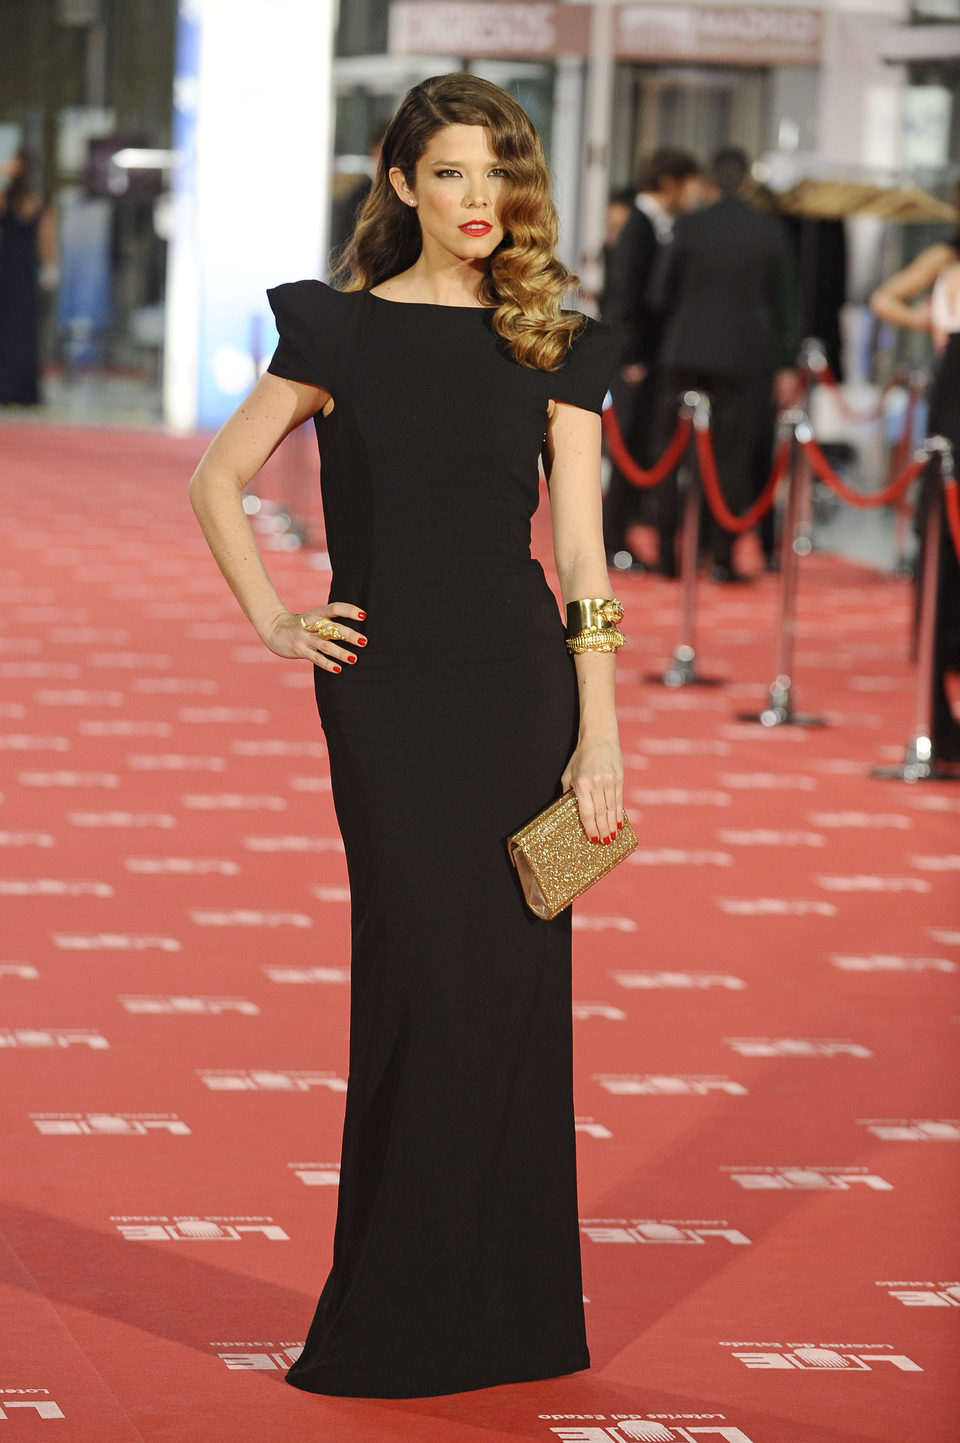 Juana Acosta posa en la alfombra roja de los Goya 2012